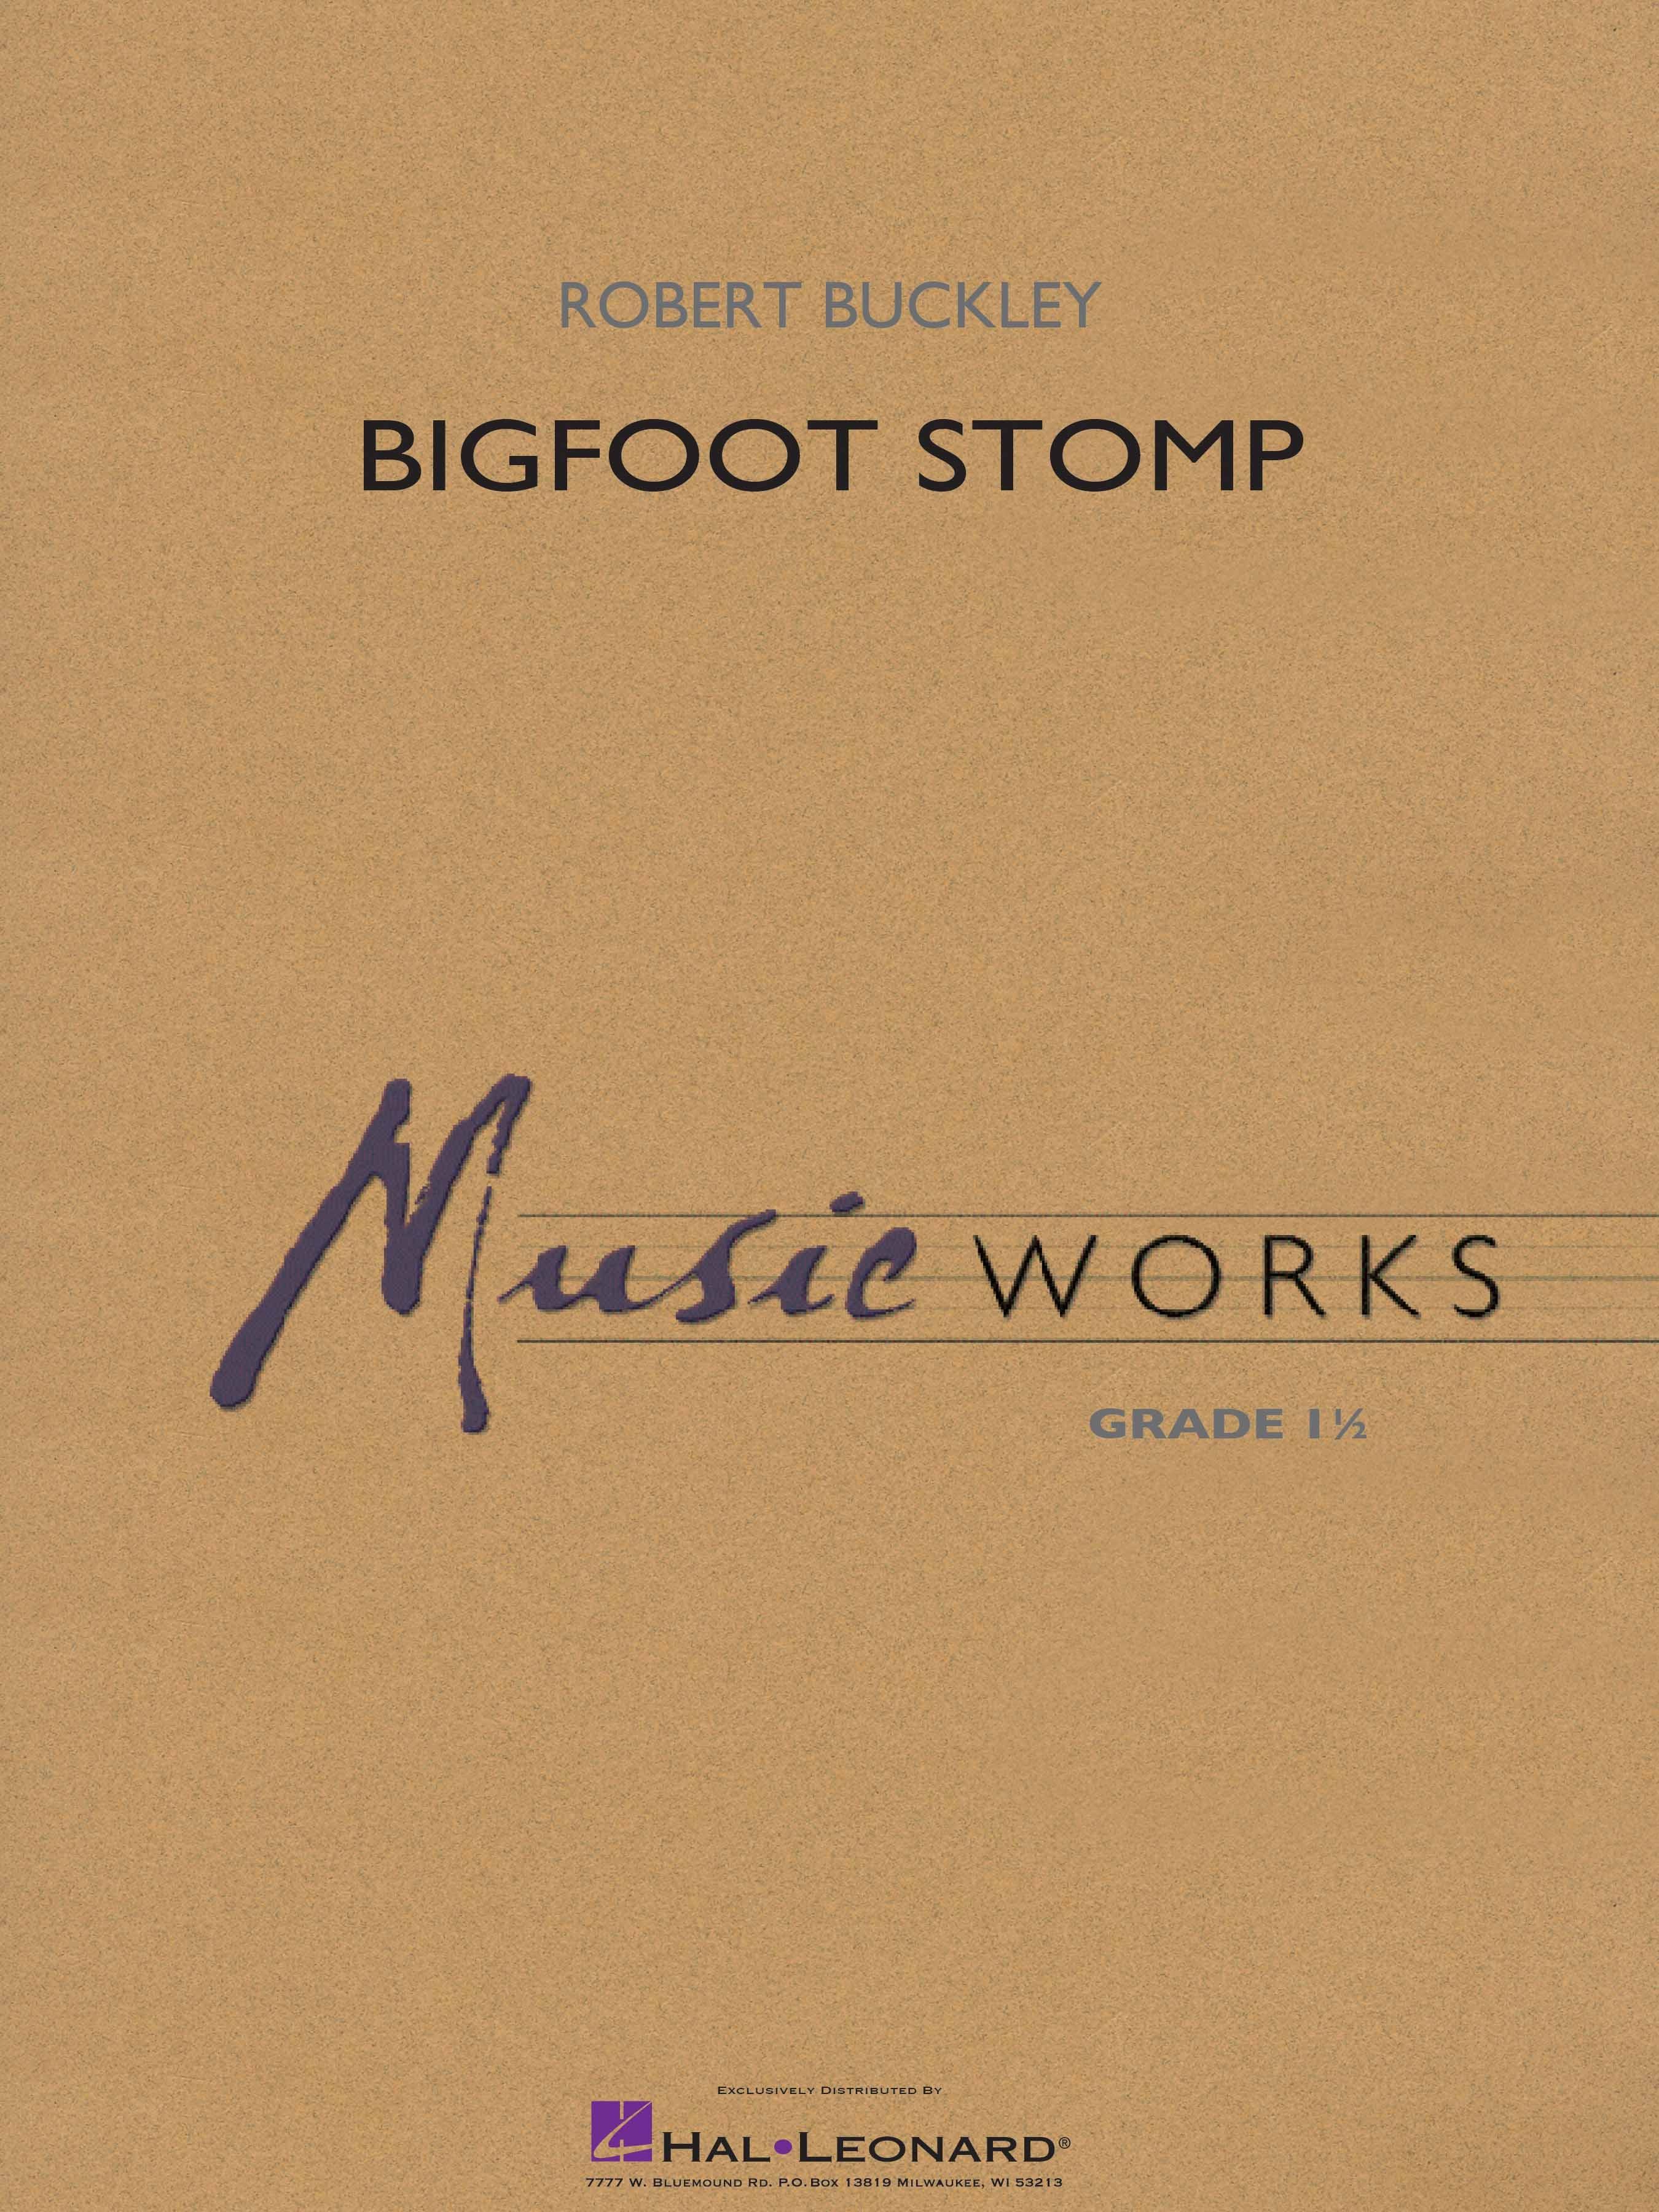 Bigfoot Stomp